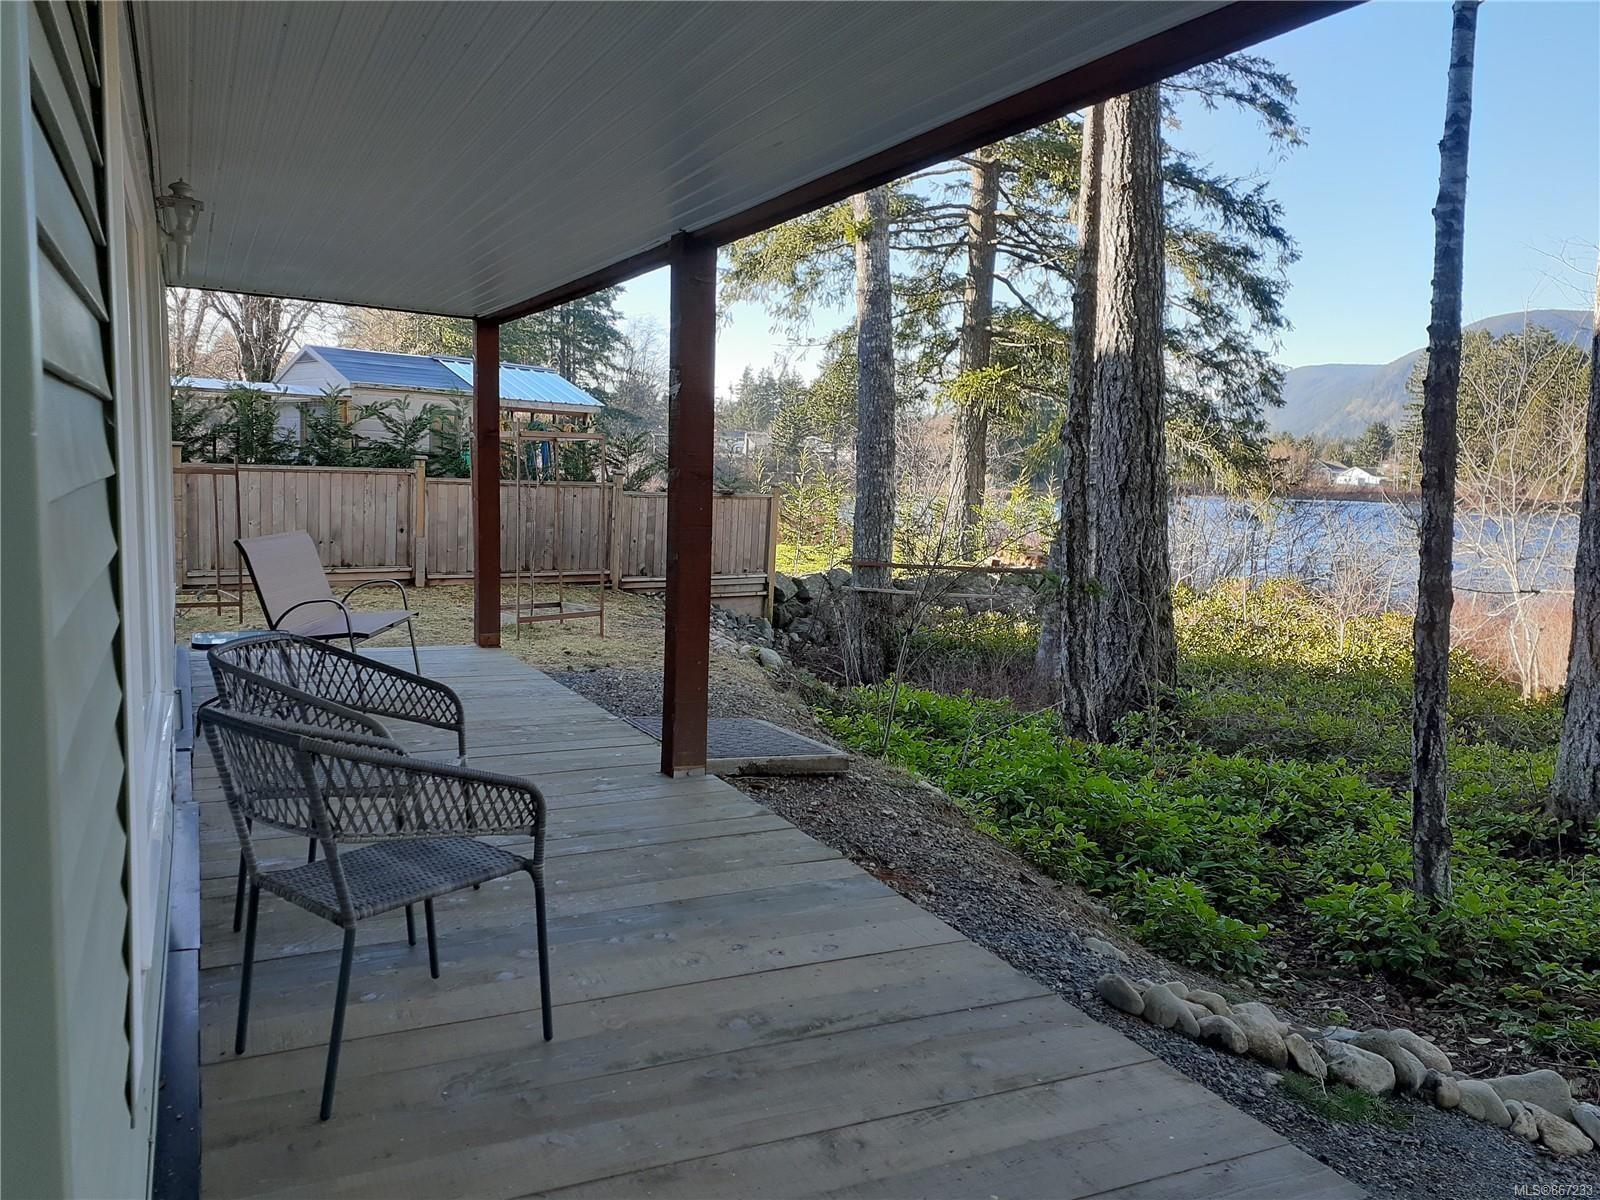 Main Photo: 233 Johel Rd in : Du Lake Cowichan House for sale (Duncan)  : MLS®# 867233